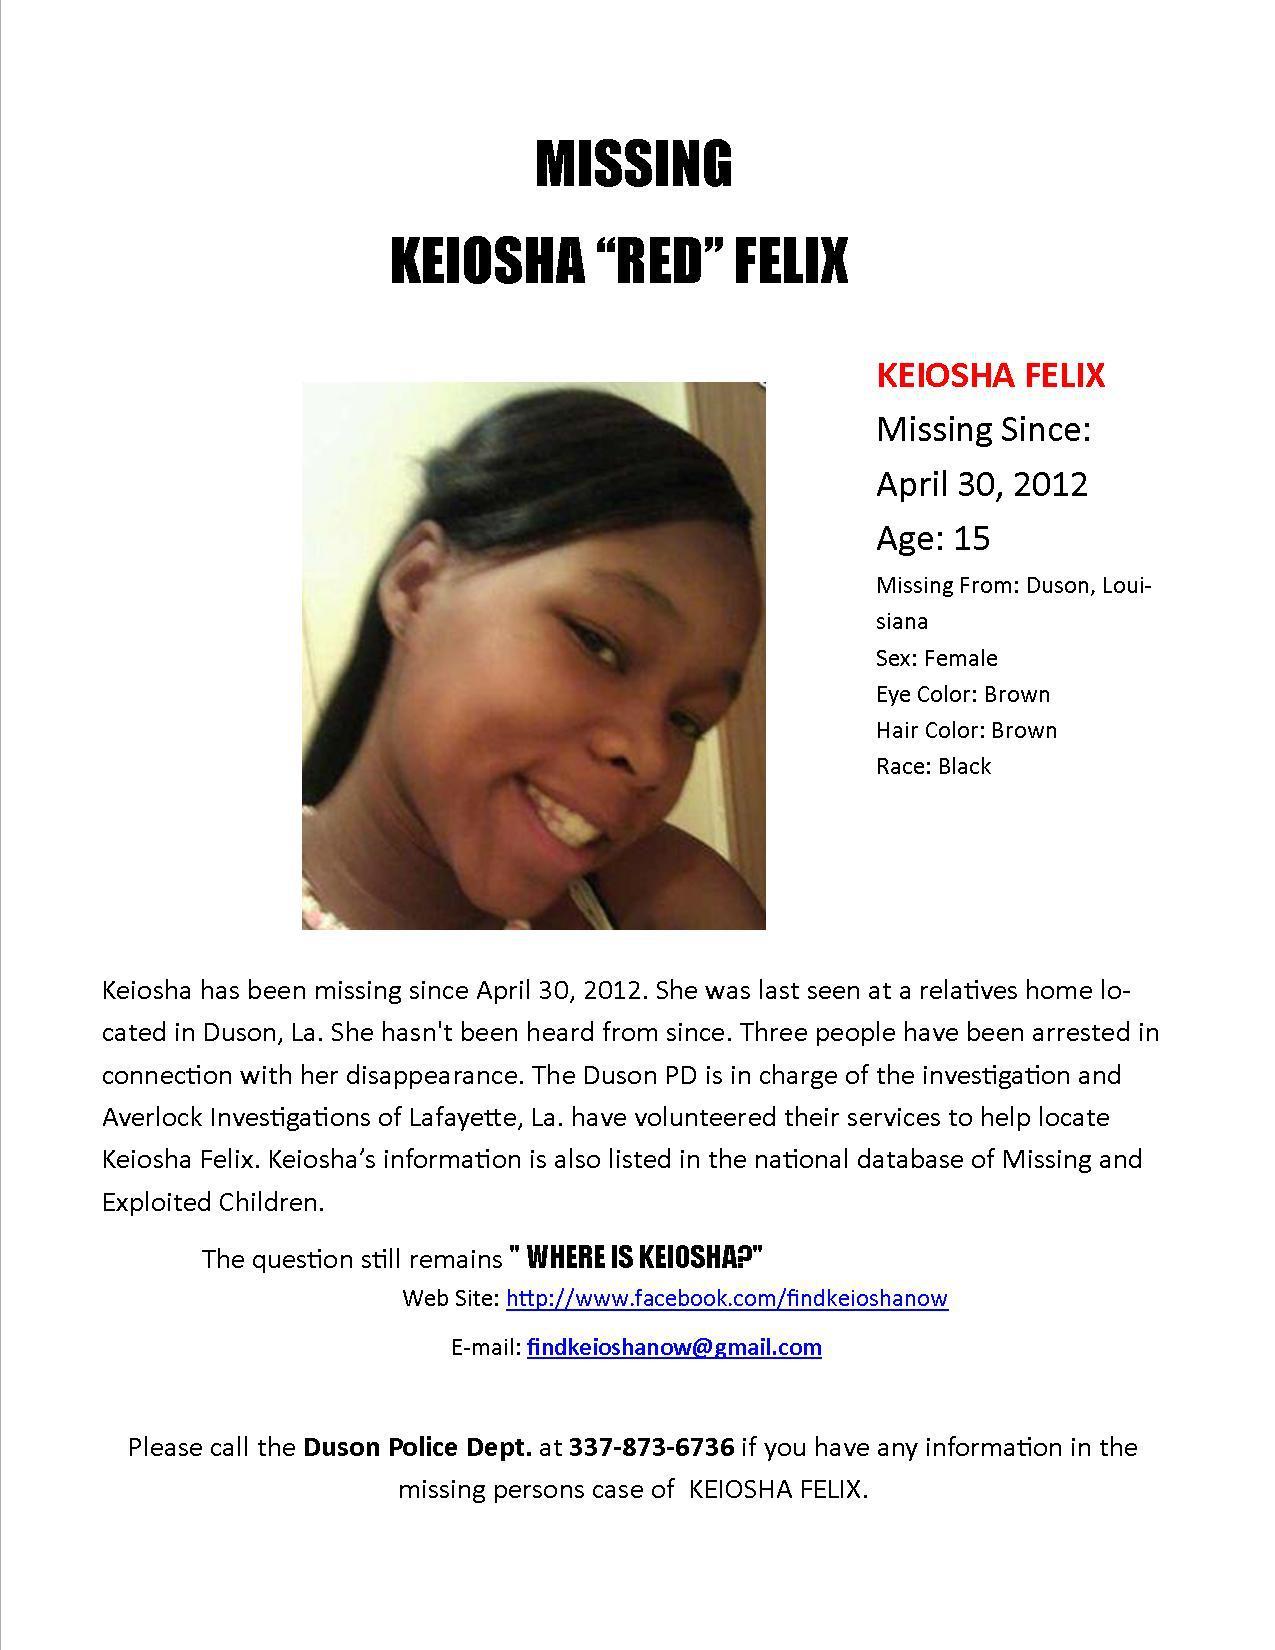 Keiosha Felix - Missing from Duson, LA